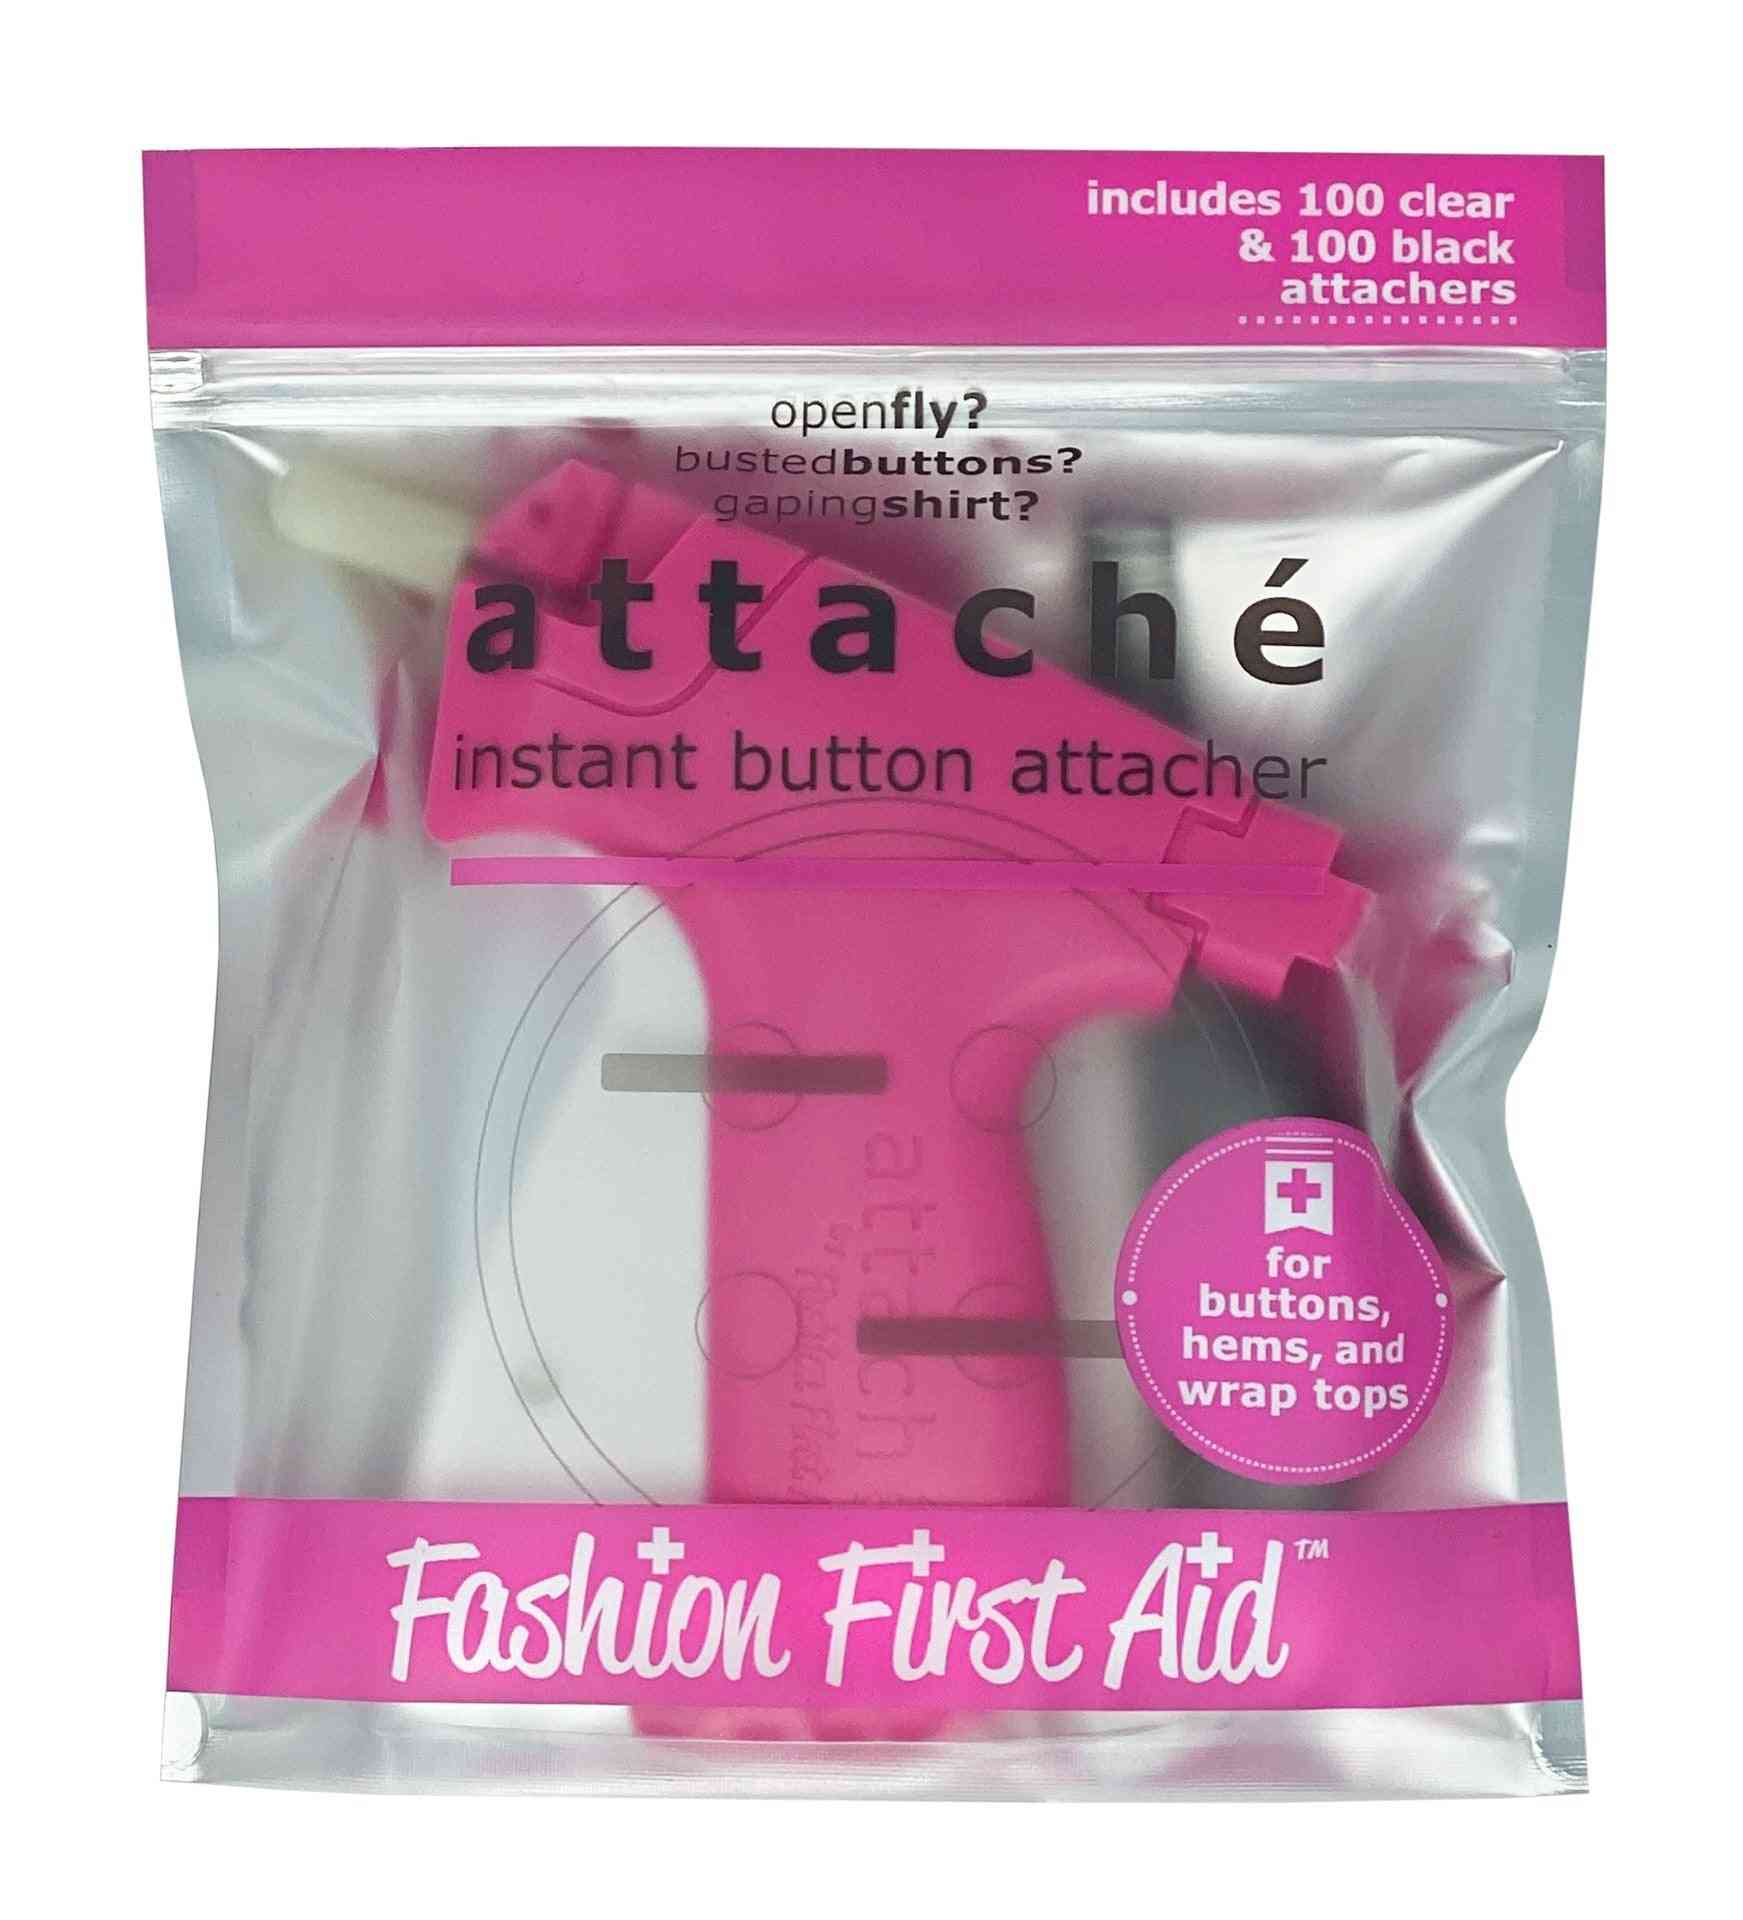 Attaché: Instant Button Attacher